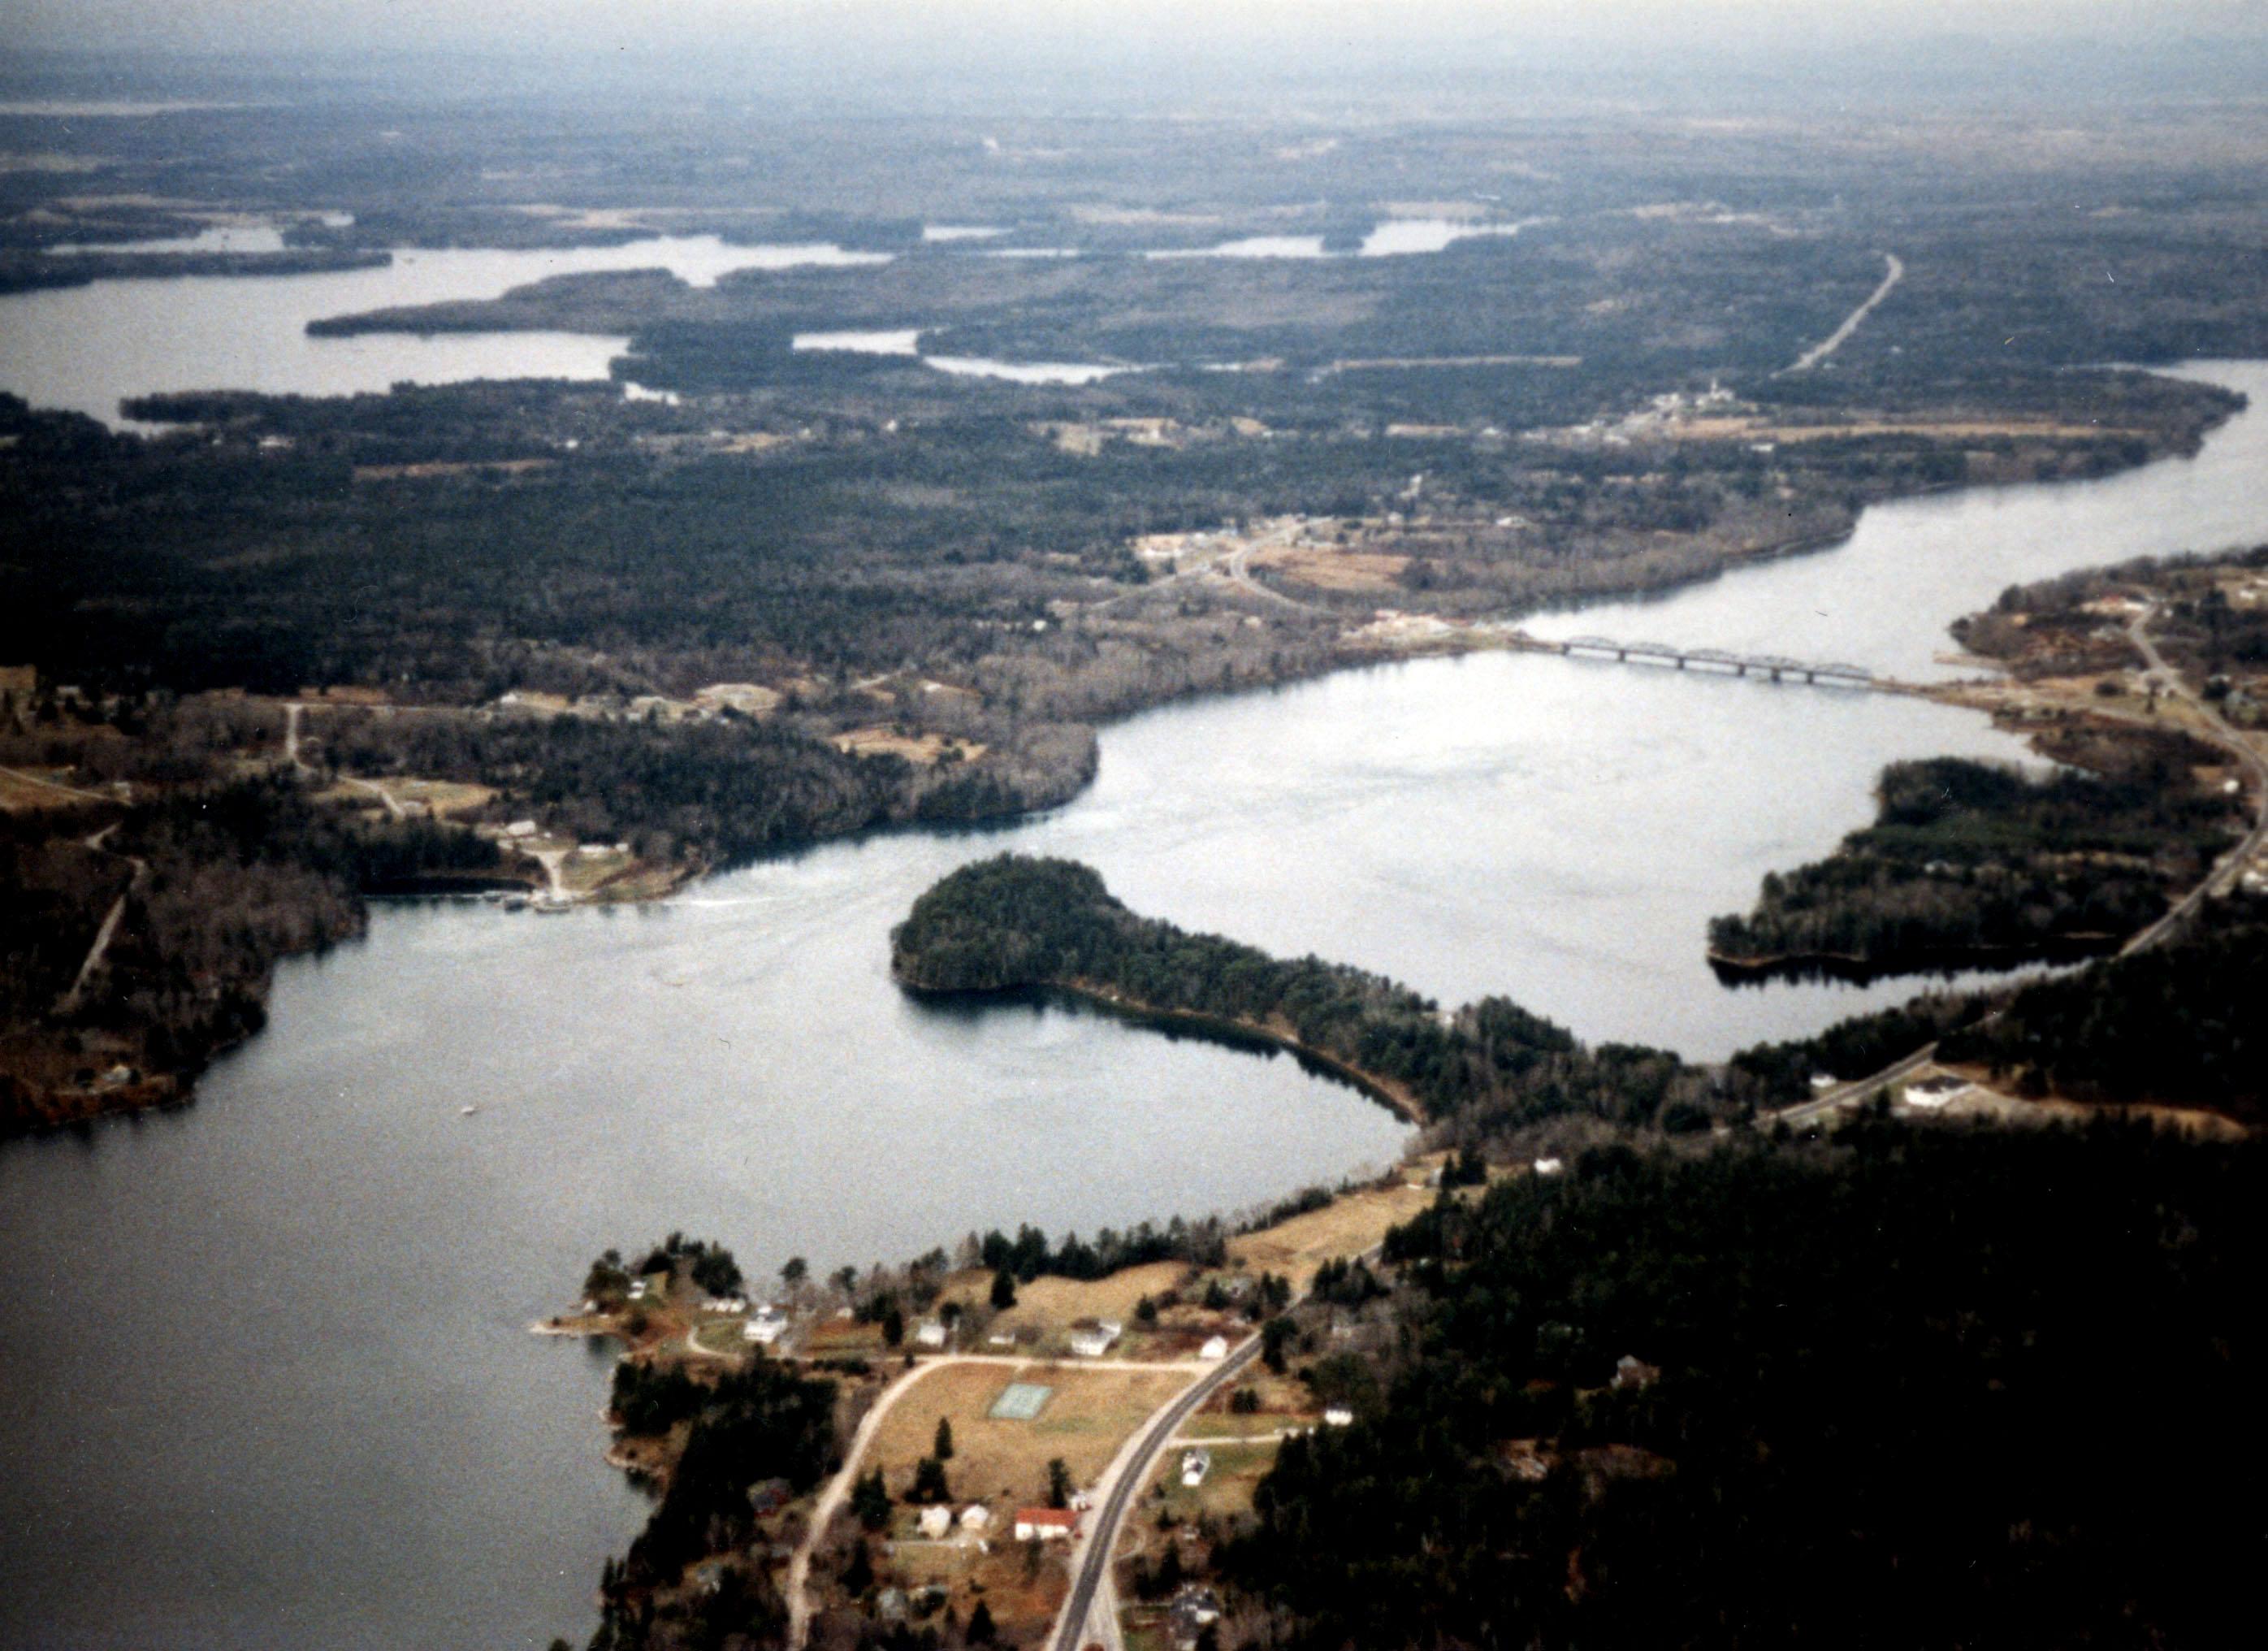 New England District > Missions > Civil Works > Navigation